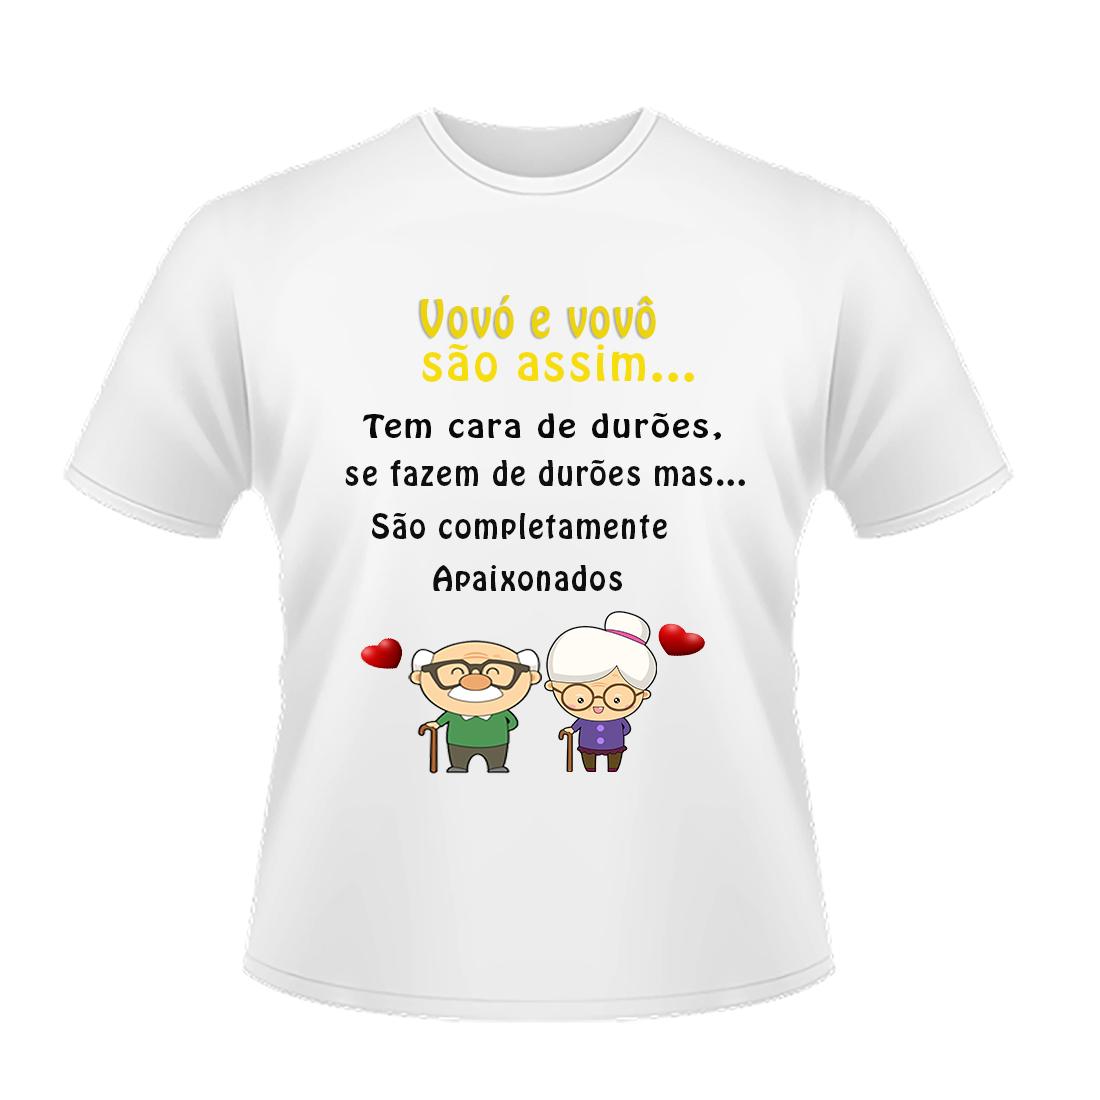 Camiseta Infantil Personalizada Vovó e vovô